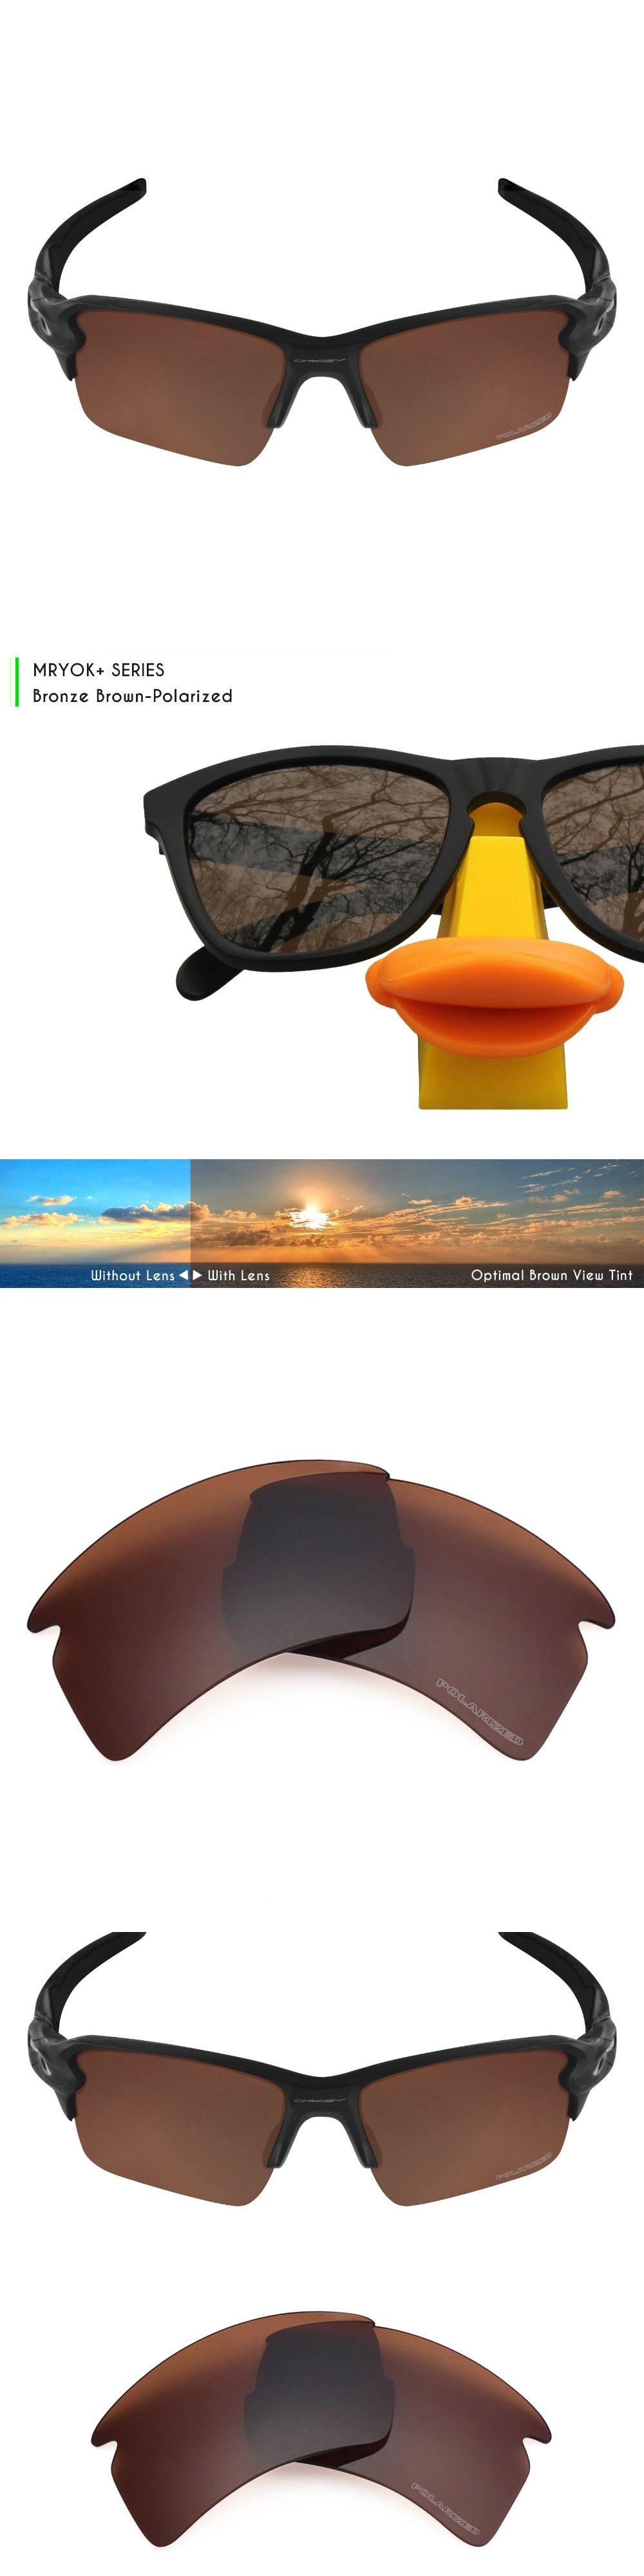 791e4a680e154 Mryok+ POLARIZED Resist SeaWater Replacement Lenses for Oakley Flak 2.0 XL  Sunglasses Bronze Brown